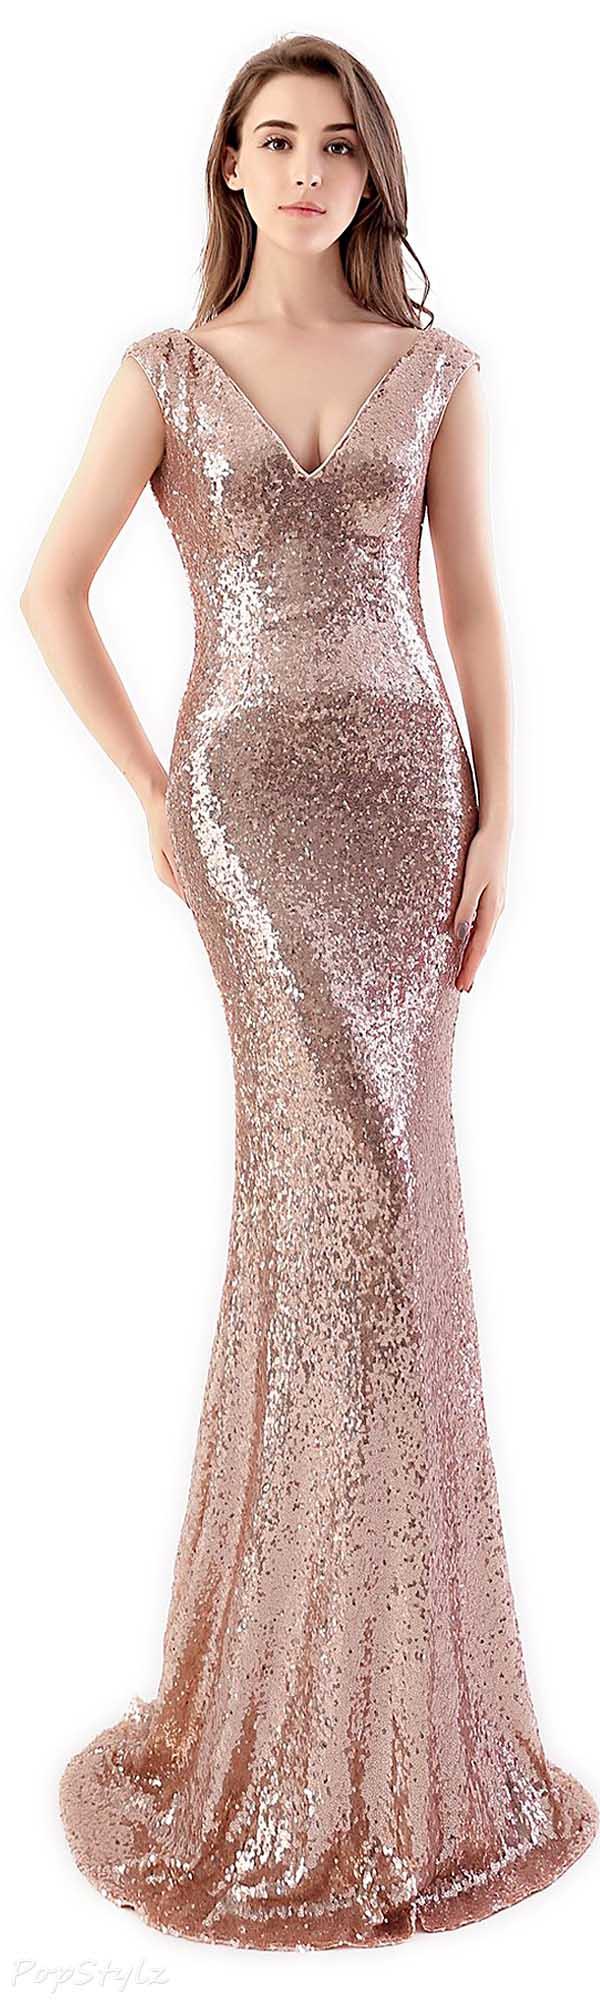 Babyonline Shining Satin & Sequins Mermaid Gown